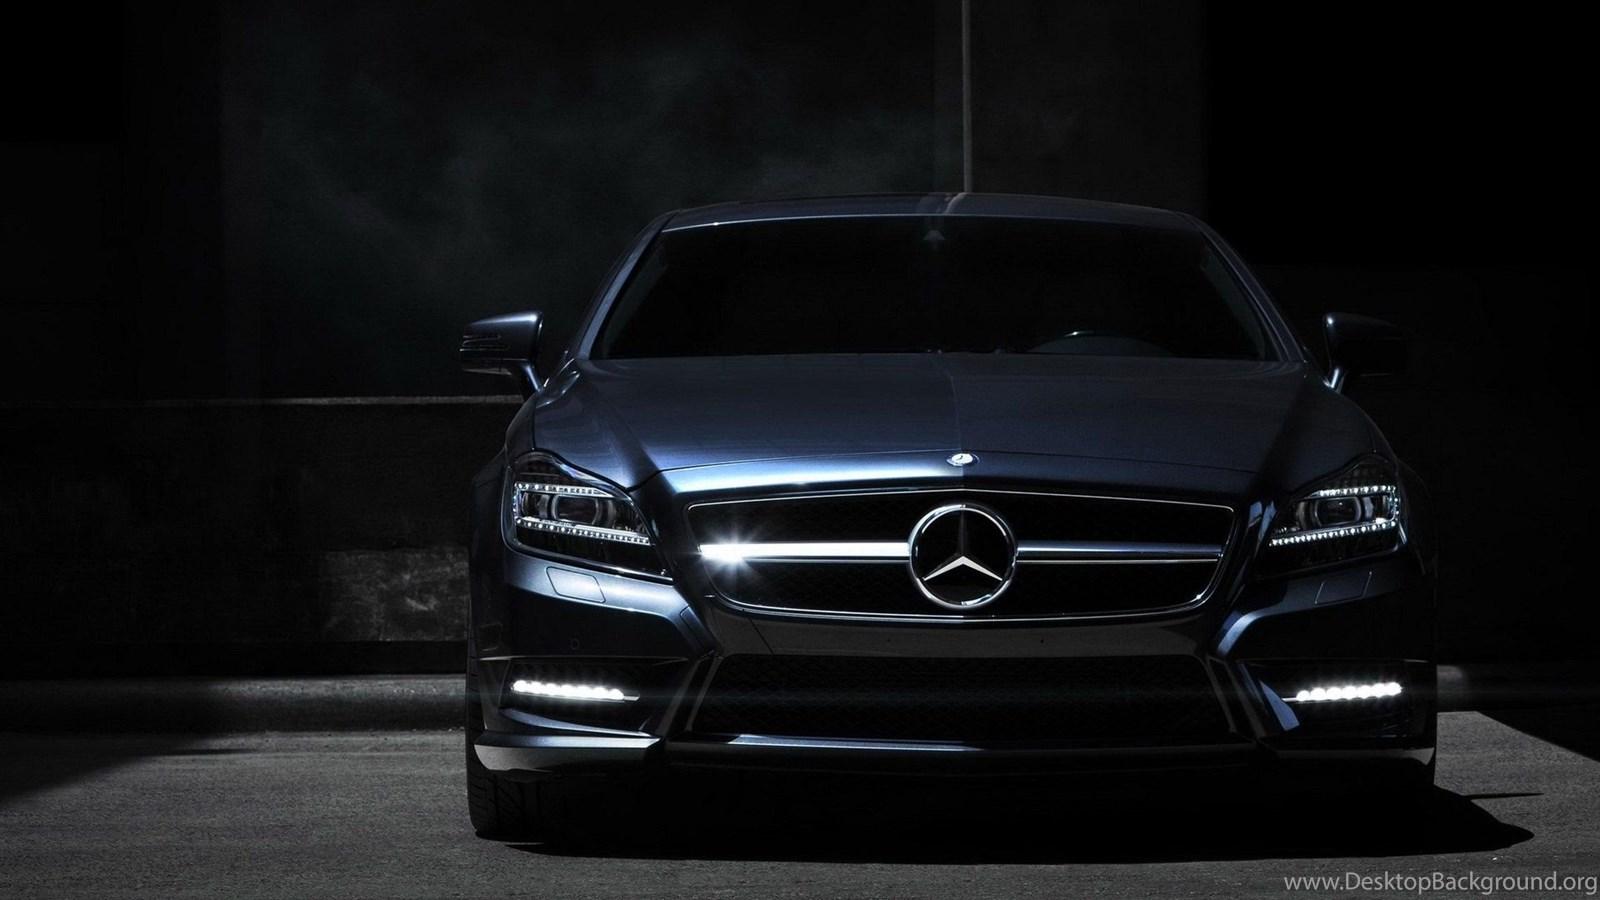 Mercedes Benz Front Black Car Night Hd Wallpapers Desktop Background